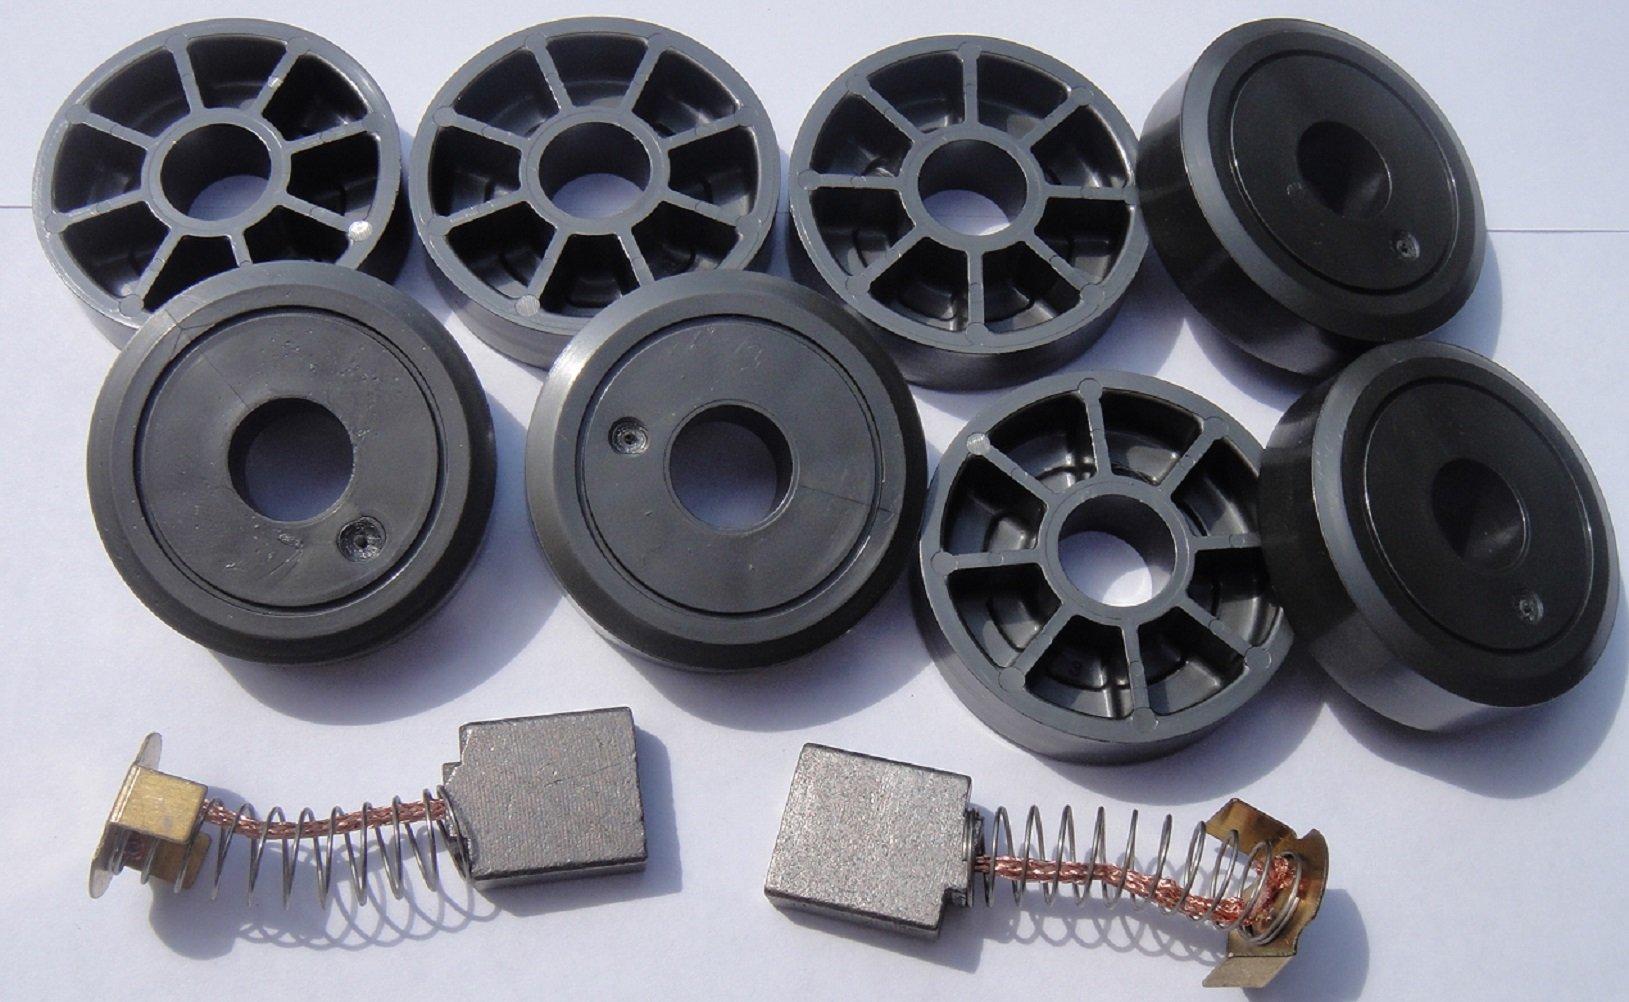 Harmar SL350 Service Kit - (2) Motor Brushes & (8) Wheels - Free Shipping by Jameson